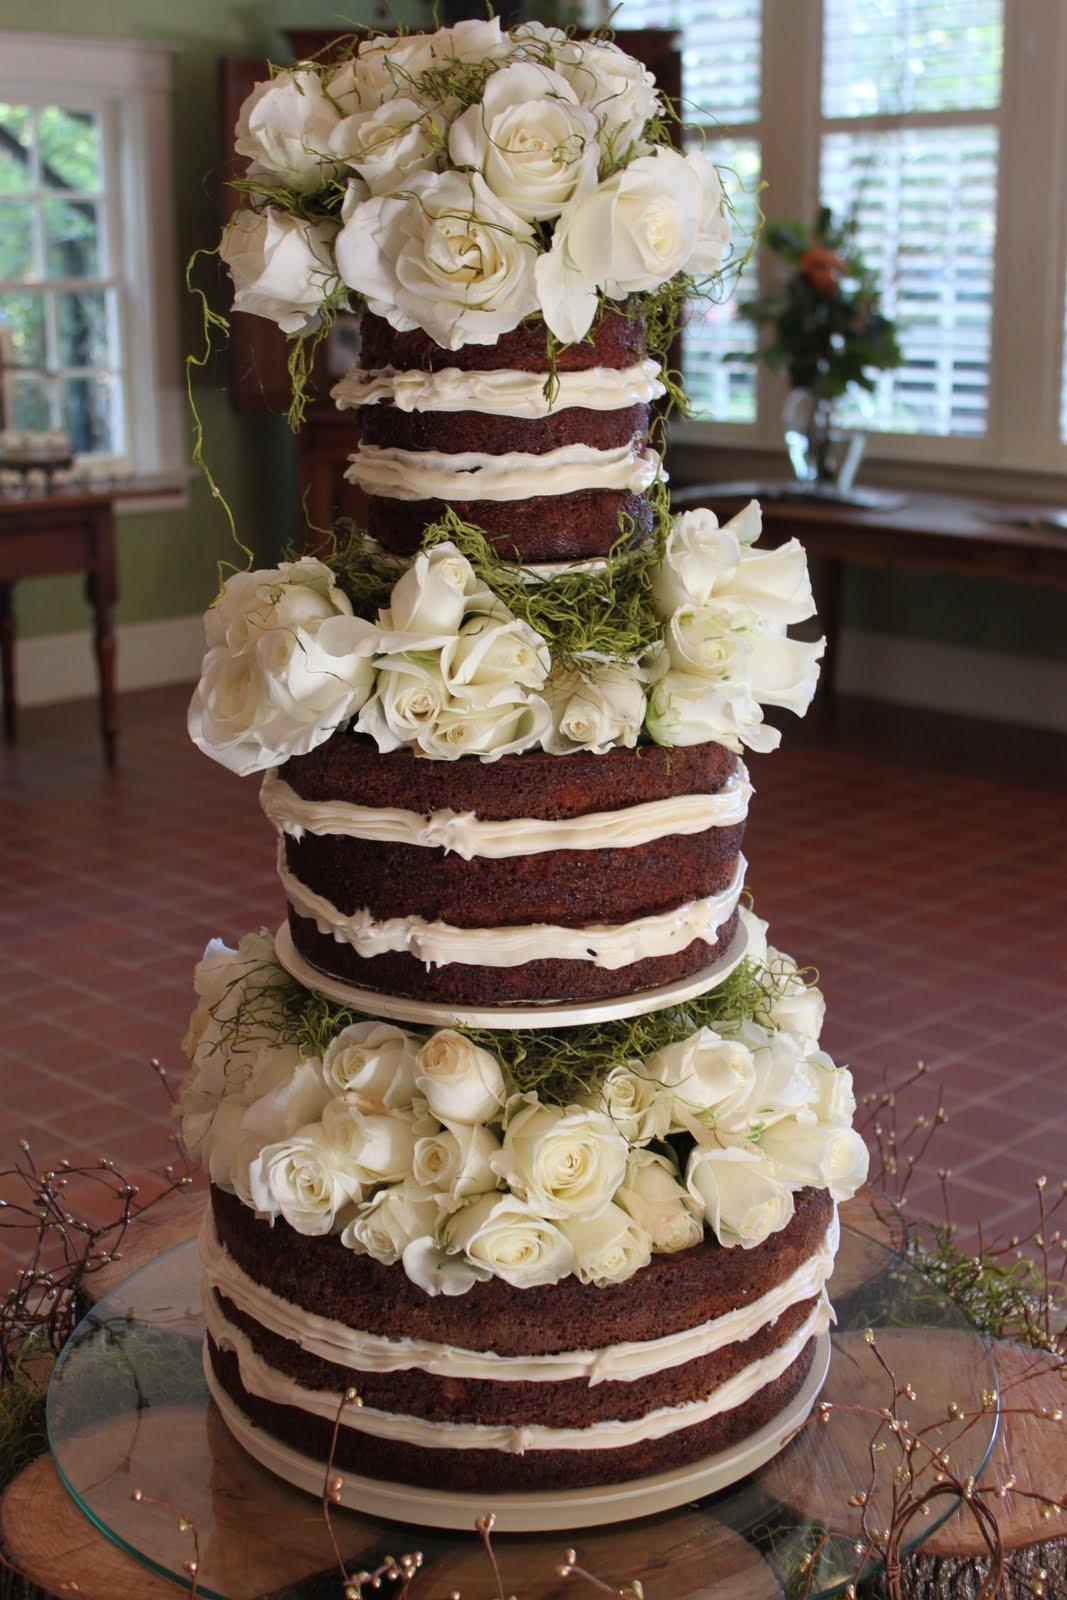 Crave. Indulge. Satisfy.: Hilary Duff Inspired Wedding Cake